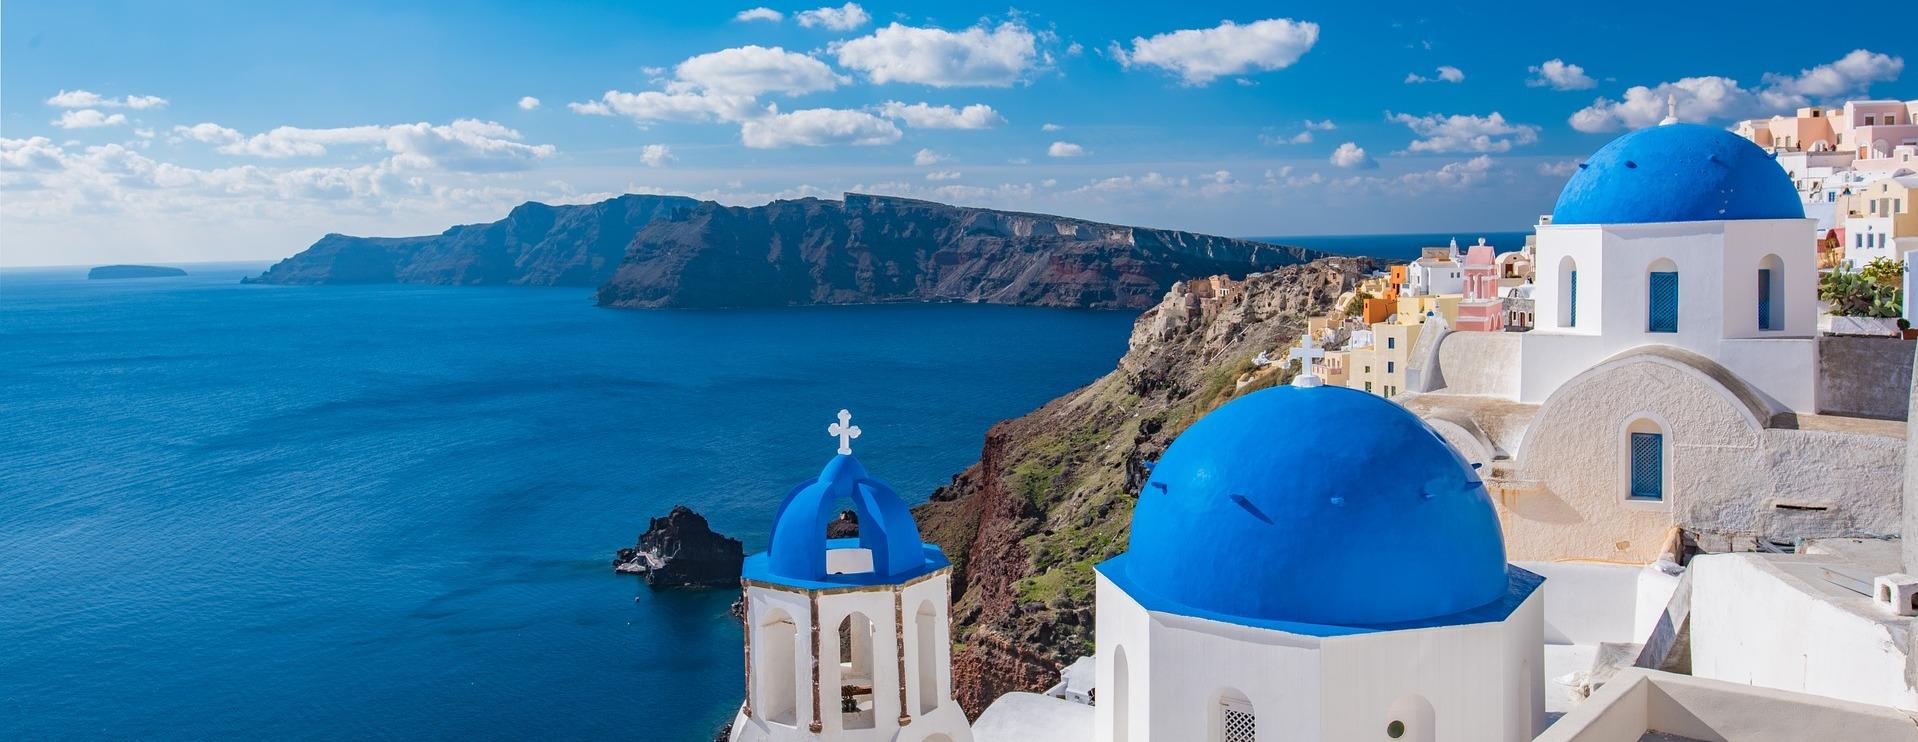 Autotransport Griechenland Fahrzeugtransport